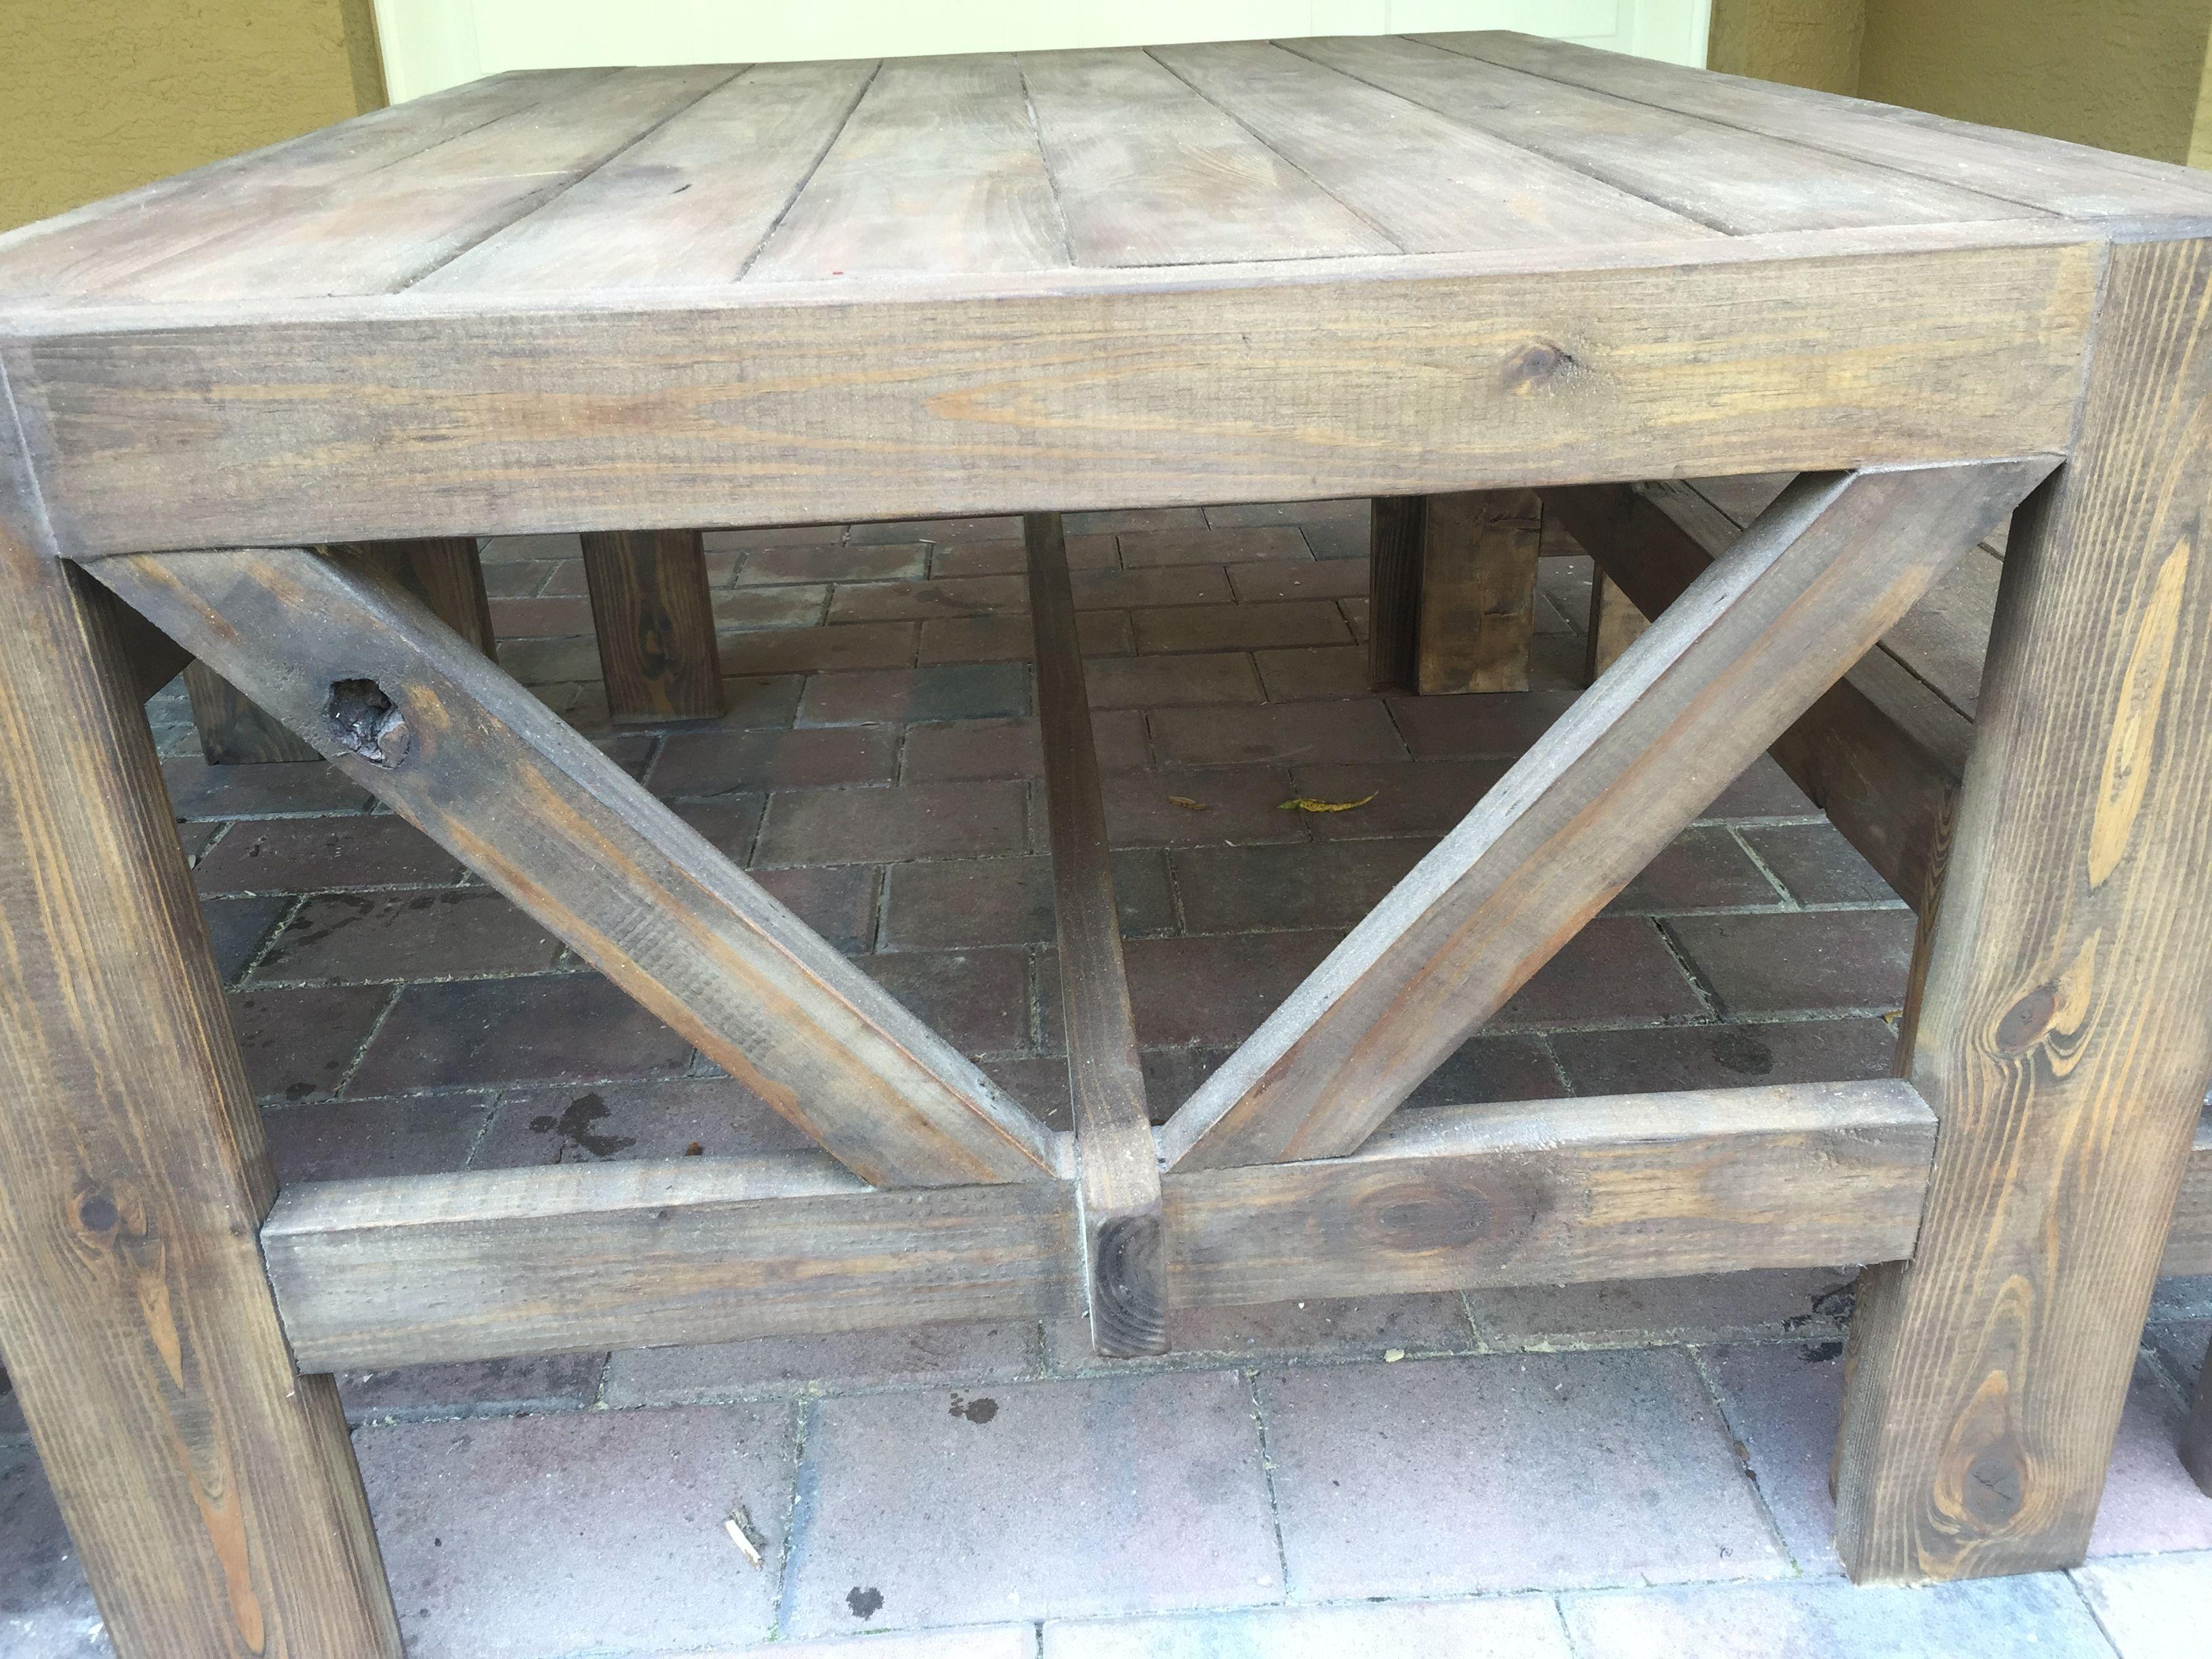 Beautiful Rustic Style   Reclaimed Wood   DIY   Www.urbanresto.com   Tampa,